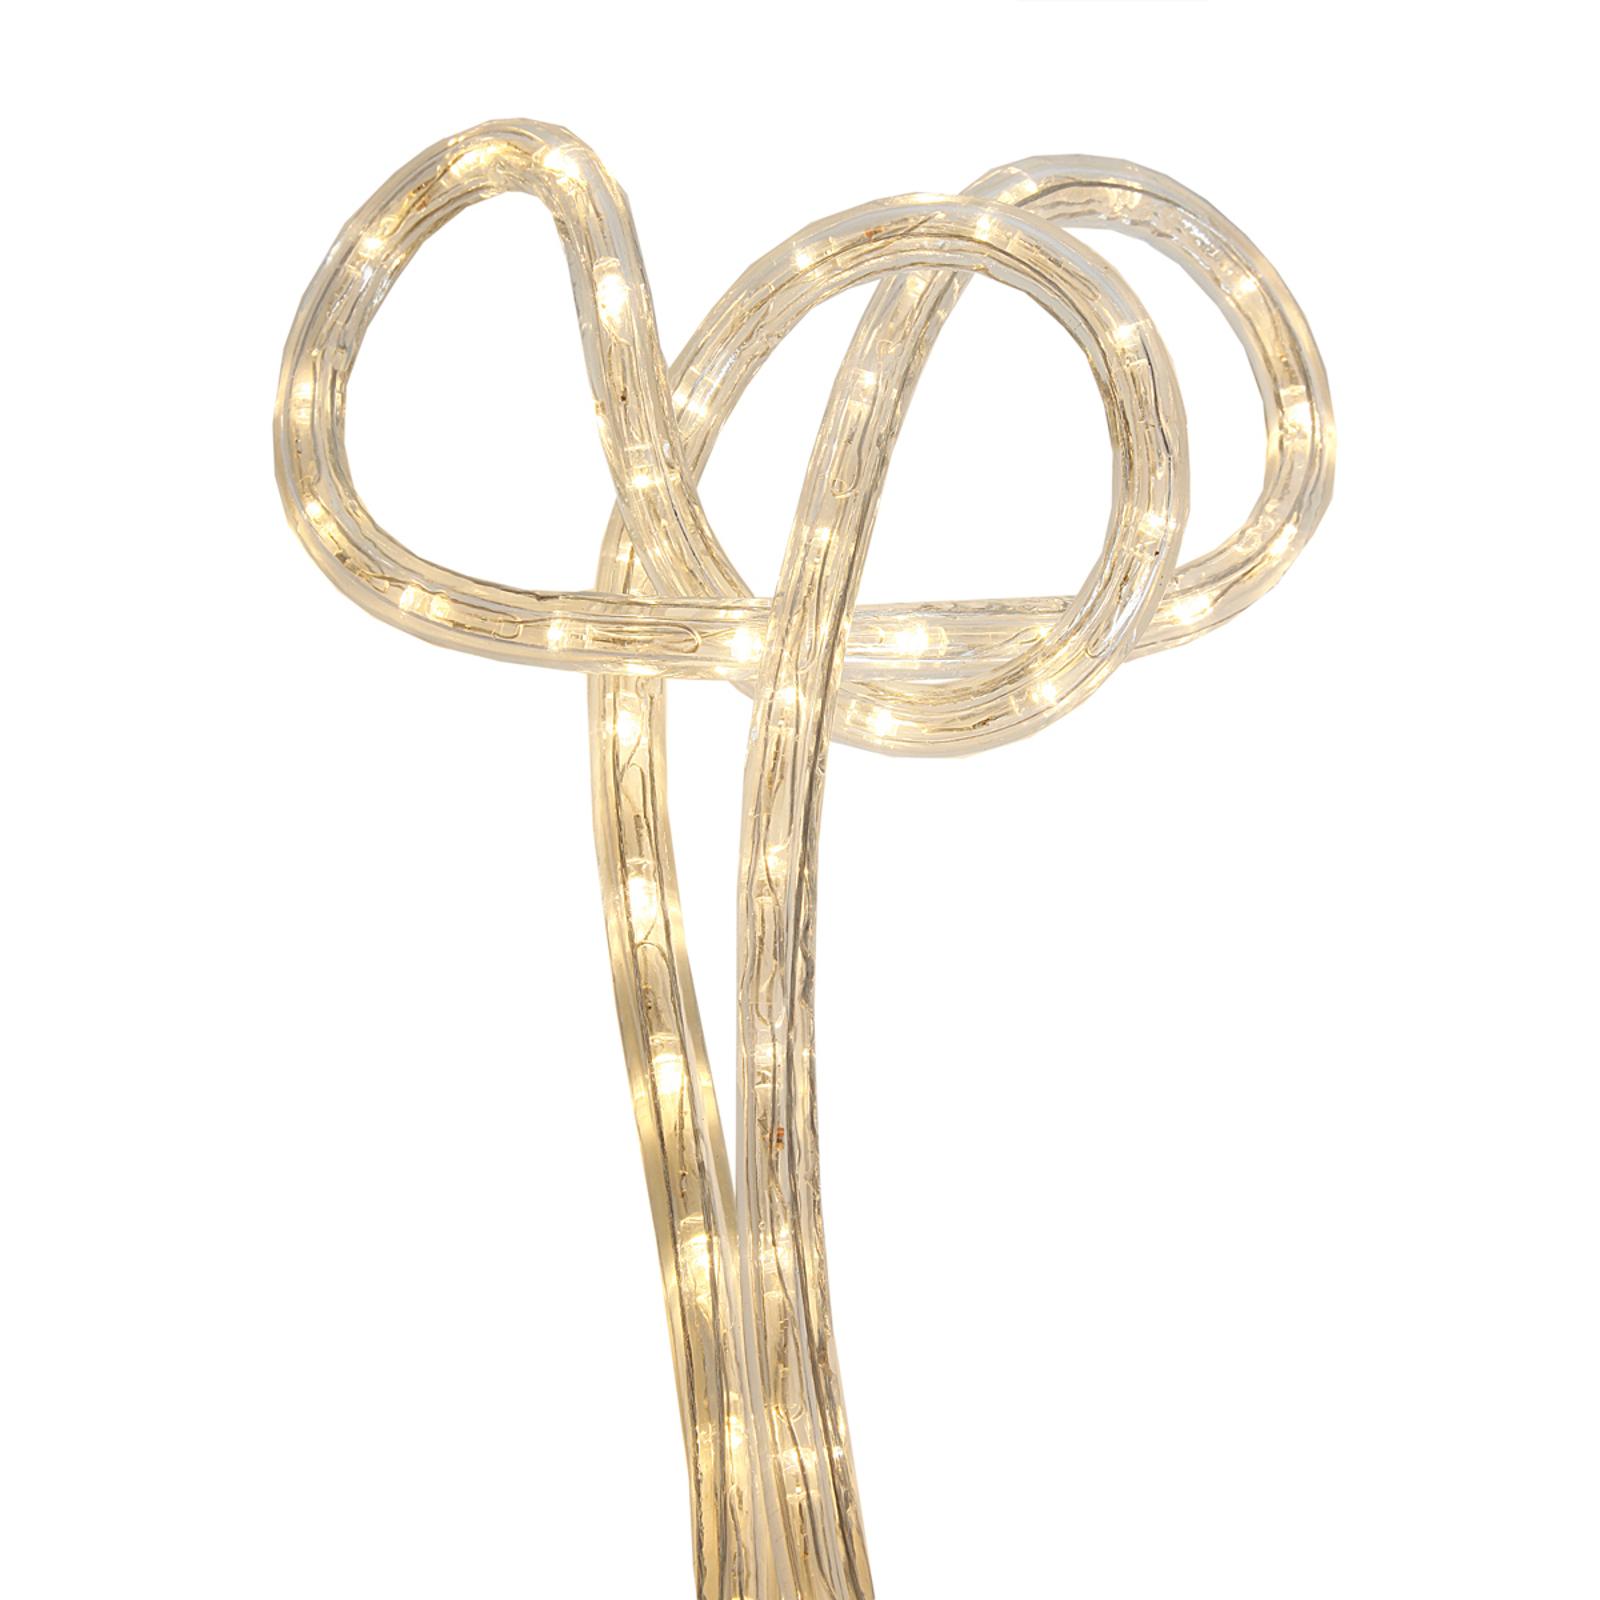 Wąż świetlny LED Rope light FLEX, 6 m, ciepła biel